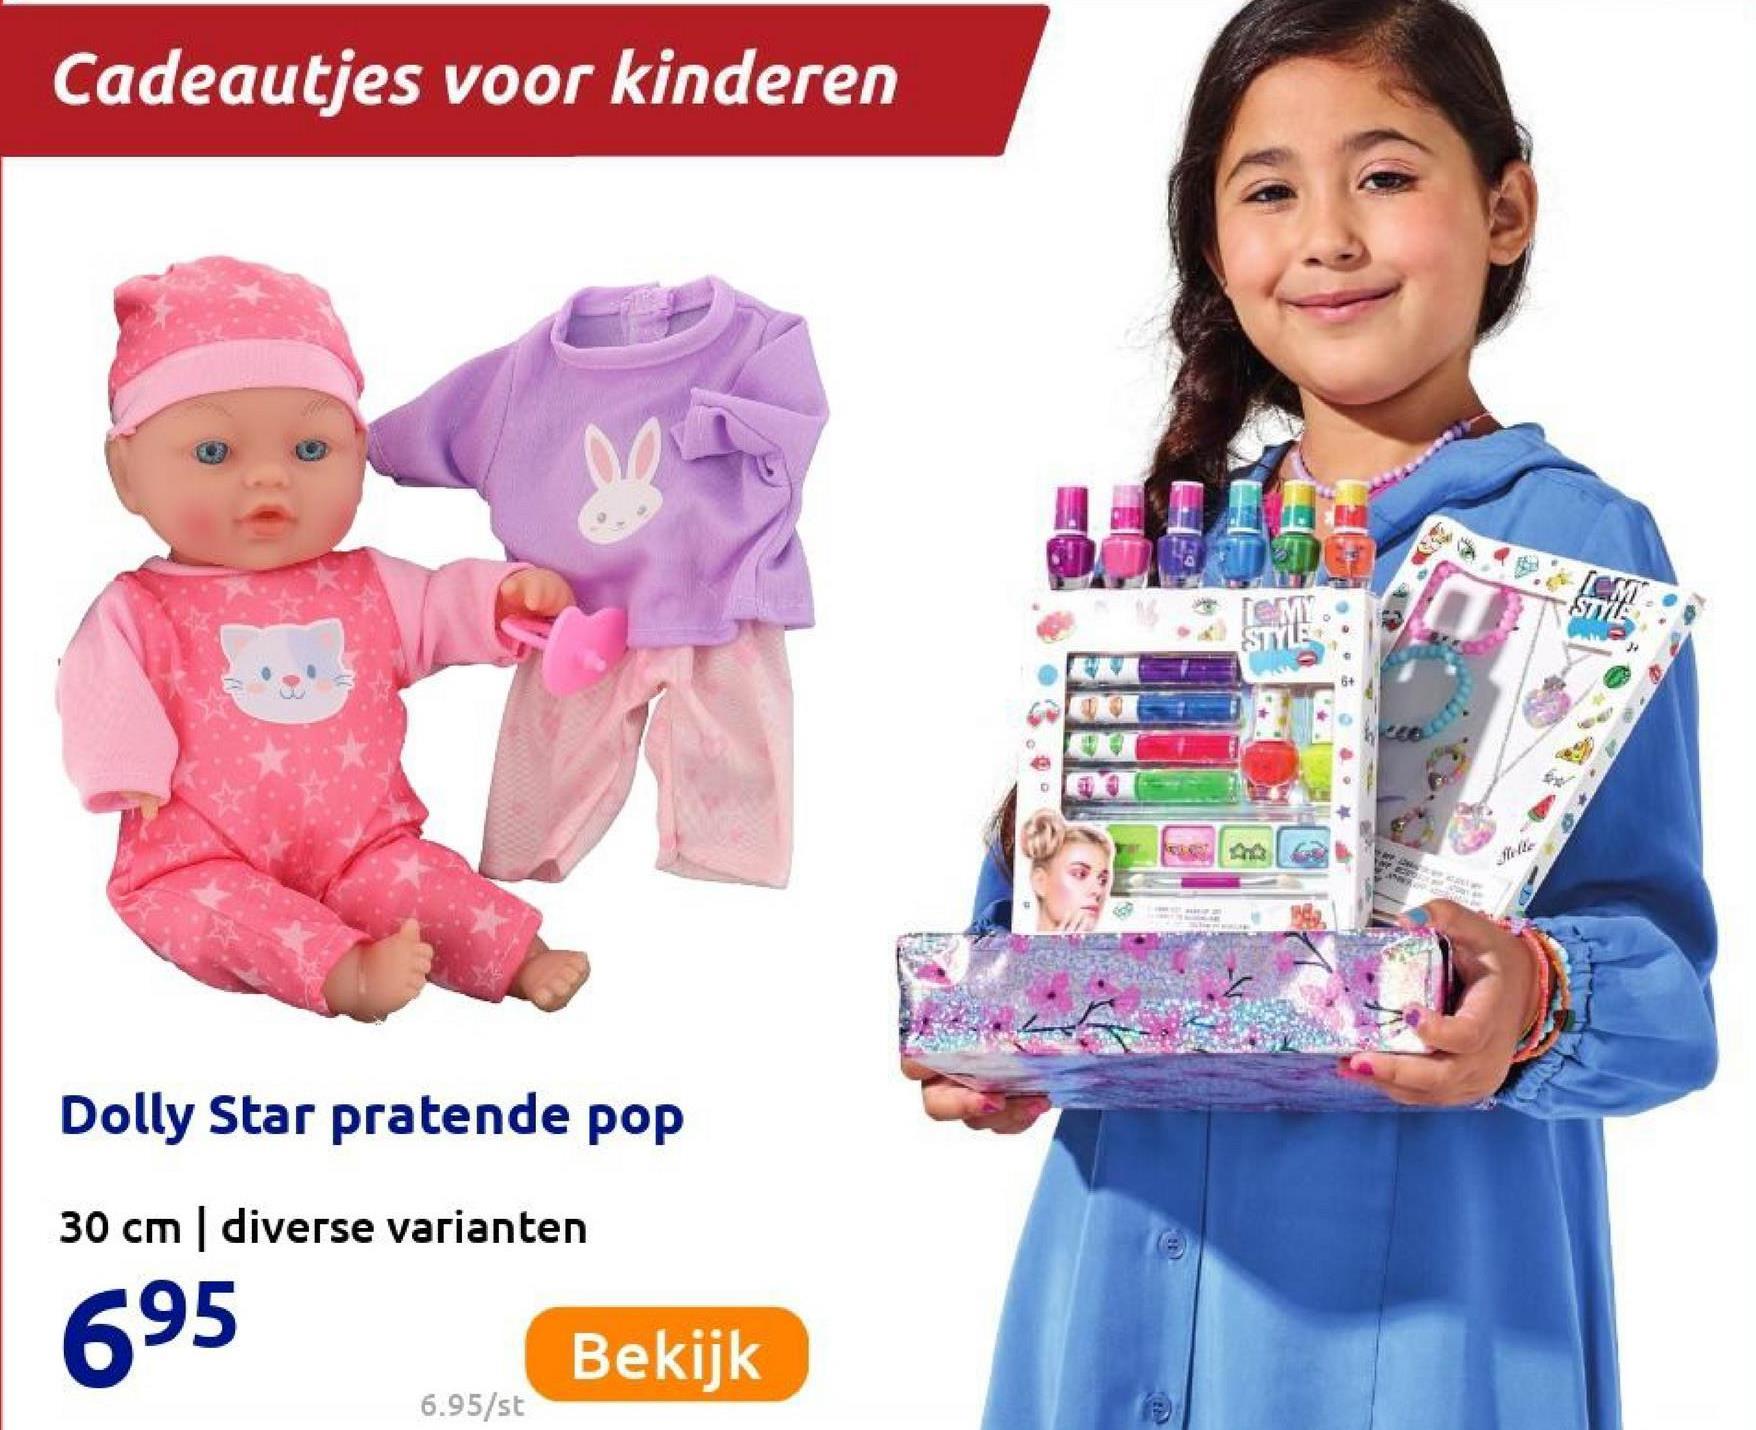 Cadeautjes voor kinderen SIMY STYLE WMF E Julle Dolly Star pratende pop 30 cm diverse varianten 695 Bekijk 6.95/st